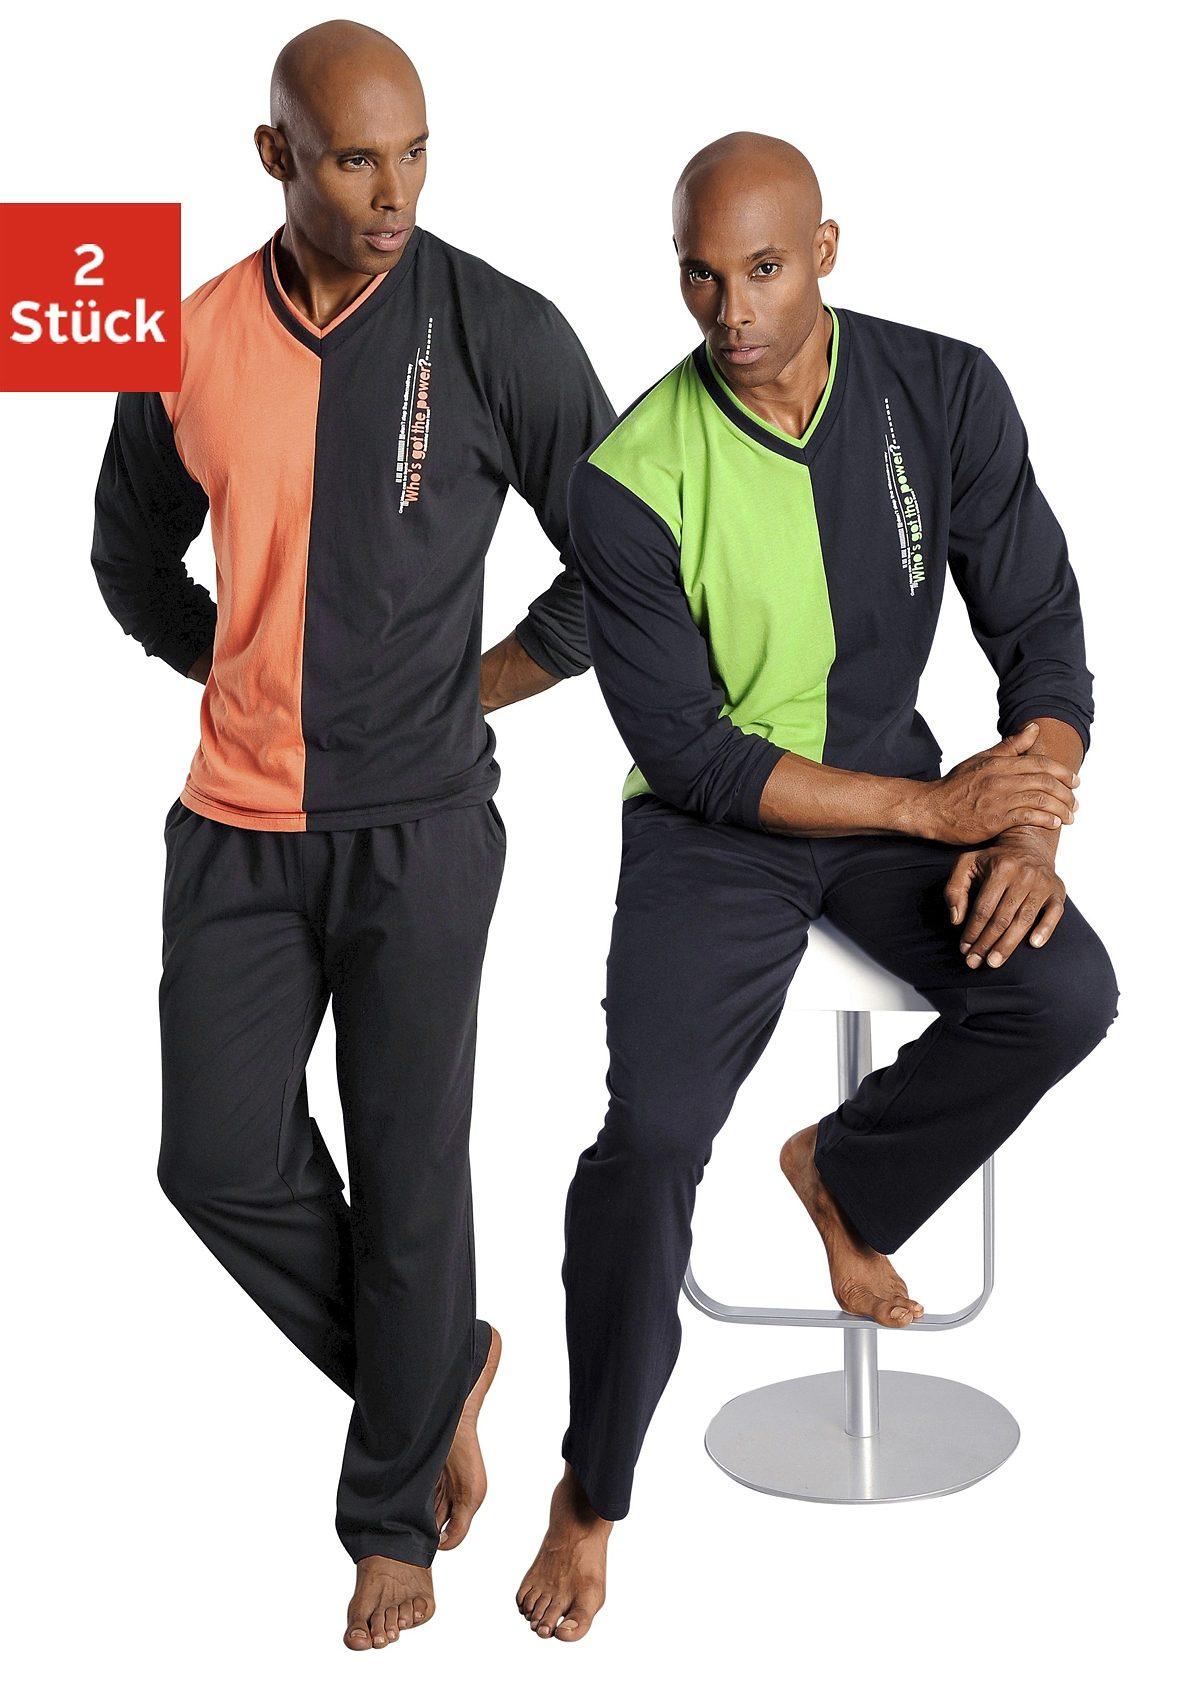 le jogger Pyjama (2 Stück)   Bekleidung > Wäsche > Nachtwäsche   Le Jogger